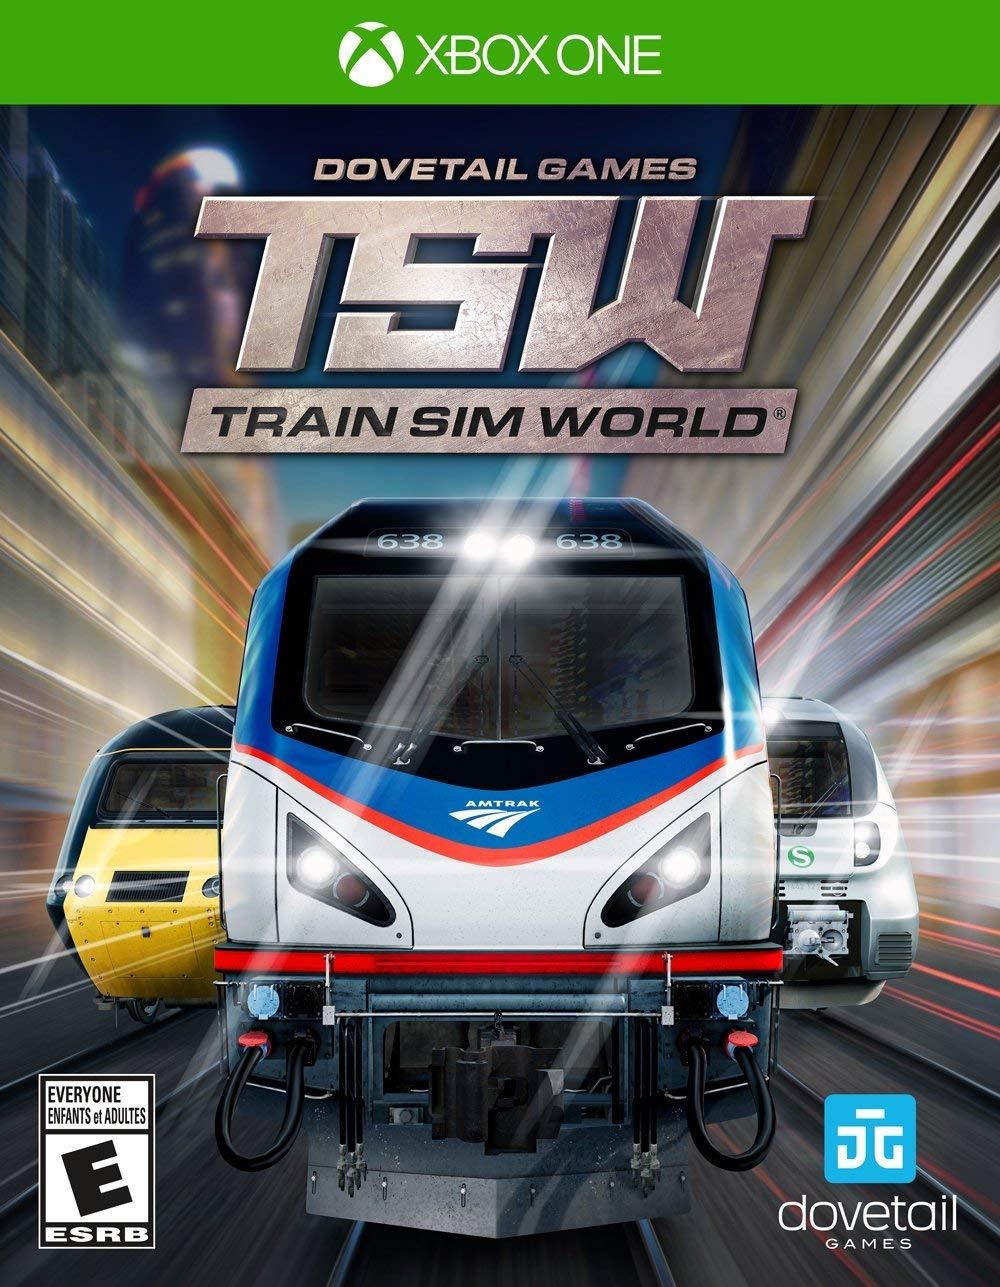 Train Sim World for Xbox One [USA]: Amazon.es: Maximum Games LLC: Cine y Series TV